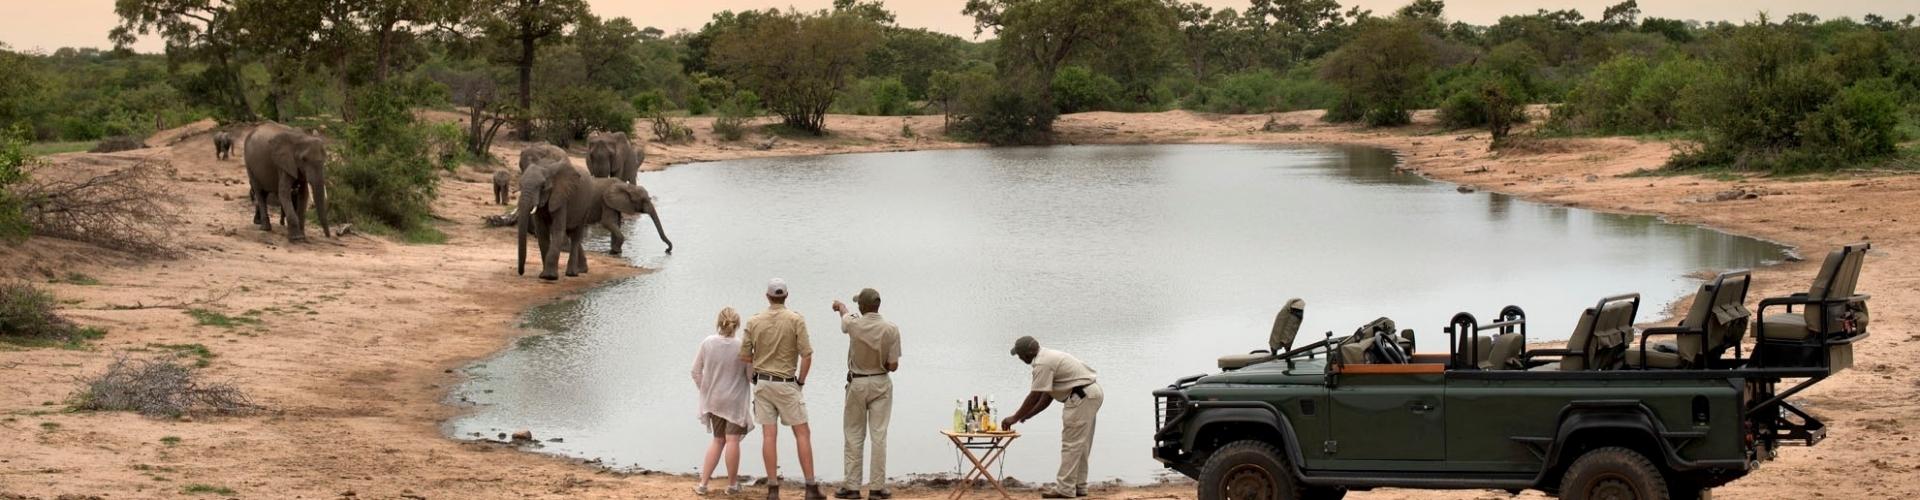 safarireizen-zuid-afrika-timbavati-header